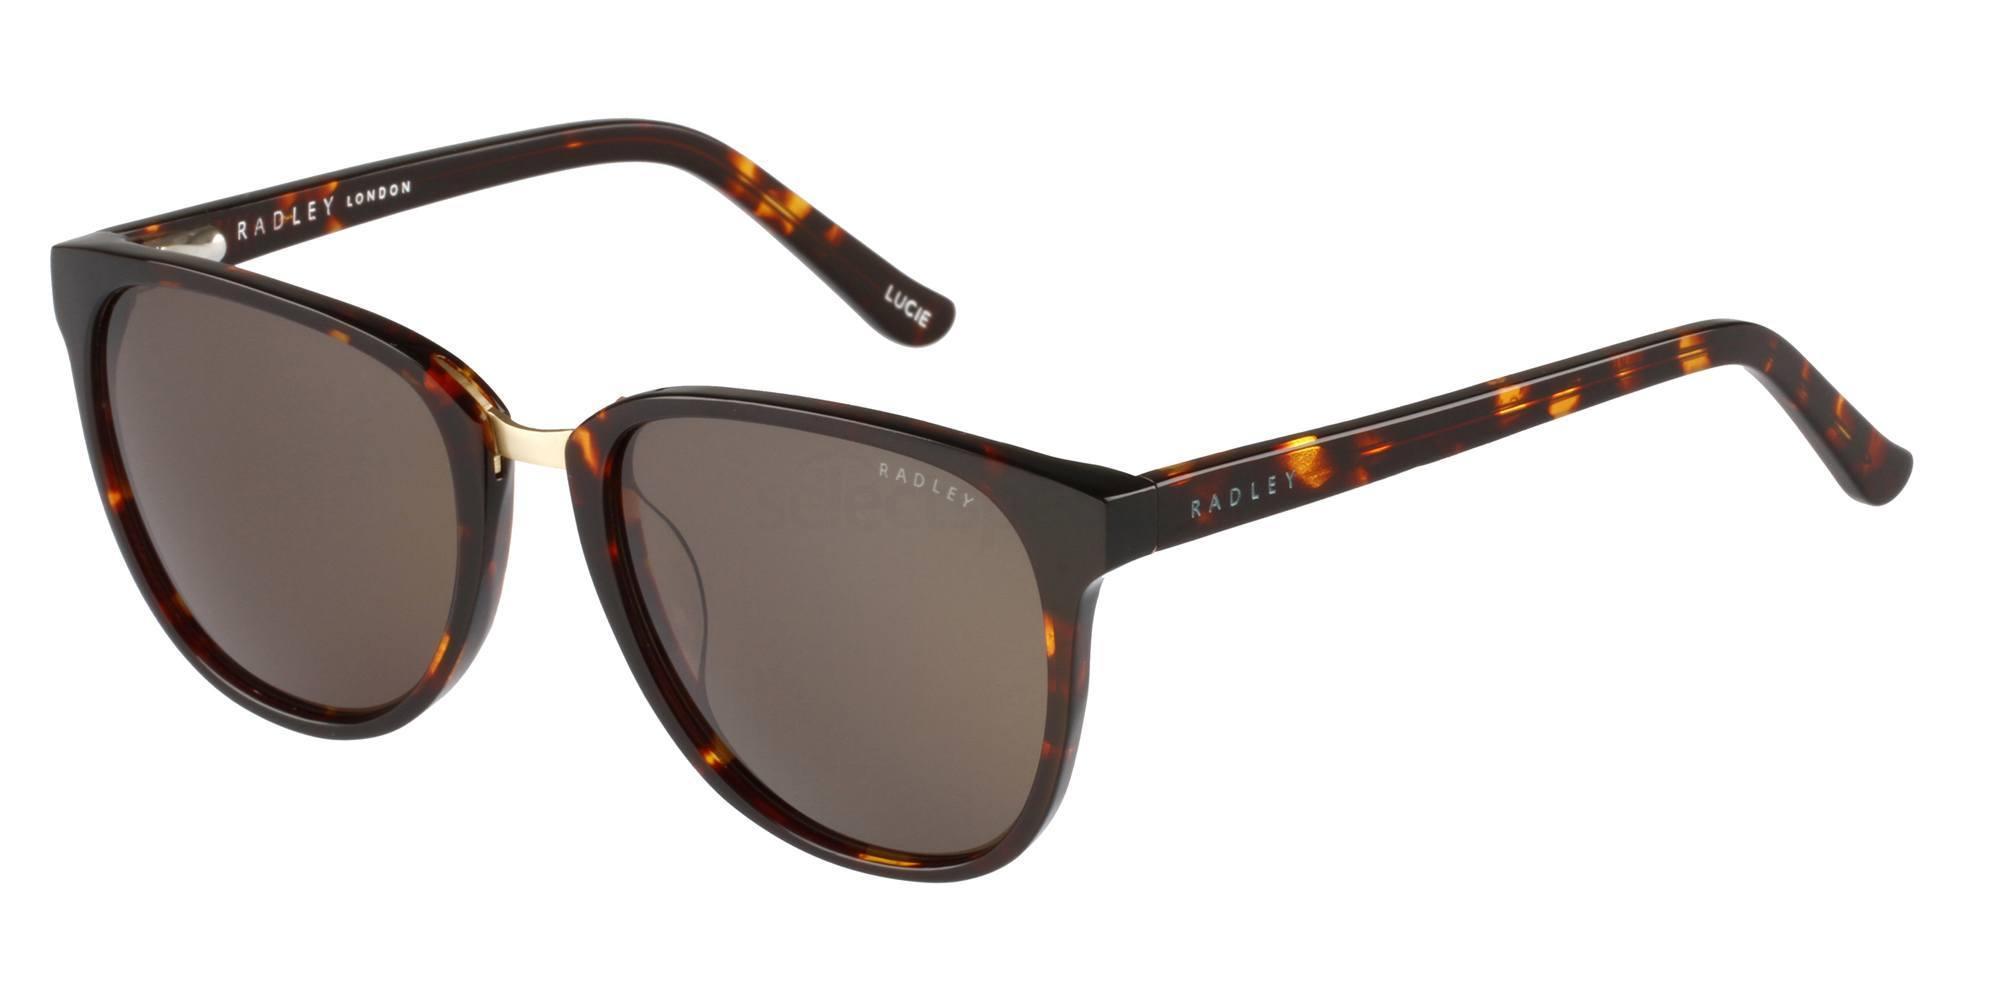 102 RDS-LUCIE Sunglasses, Radley London